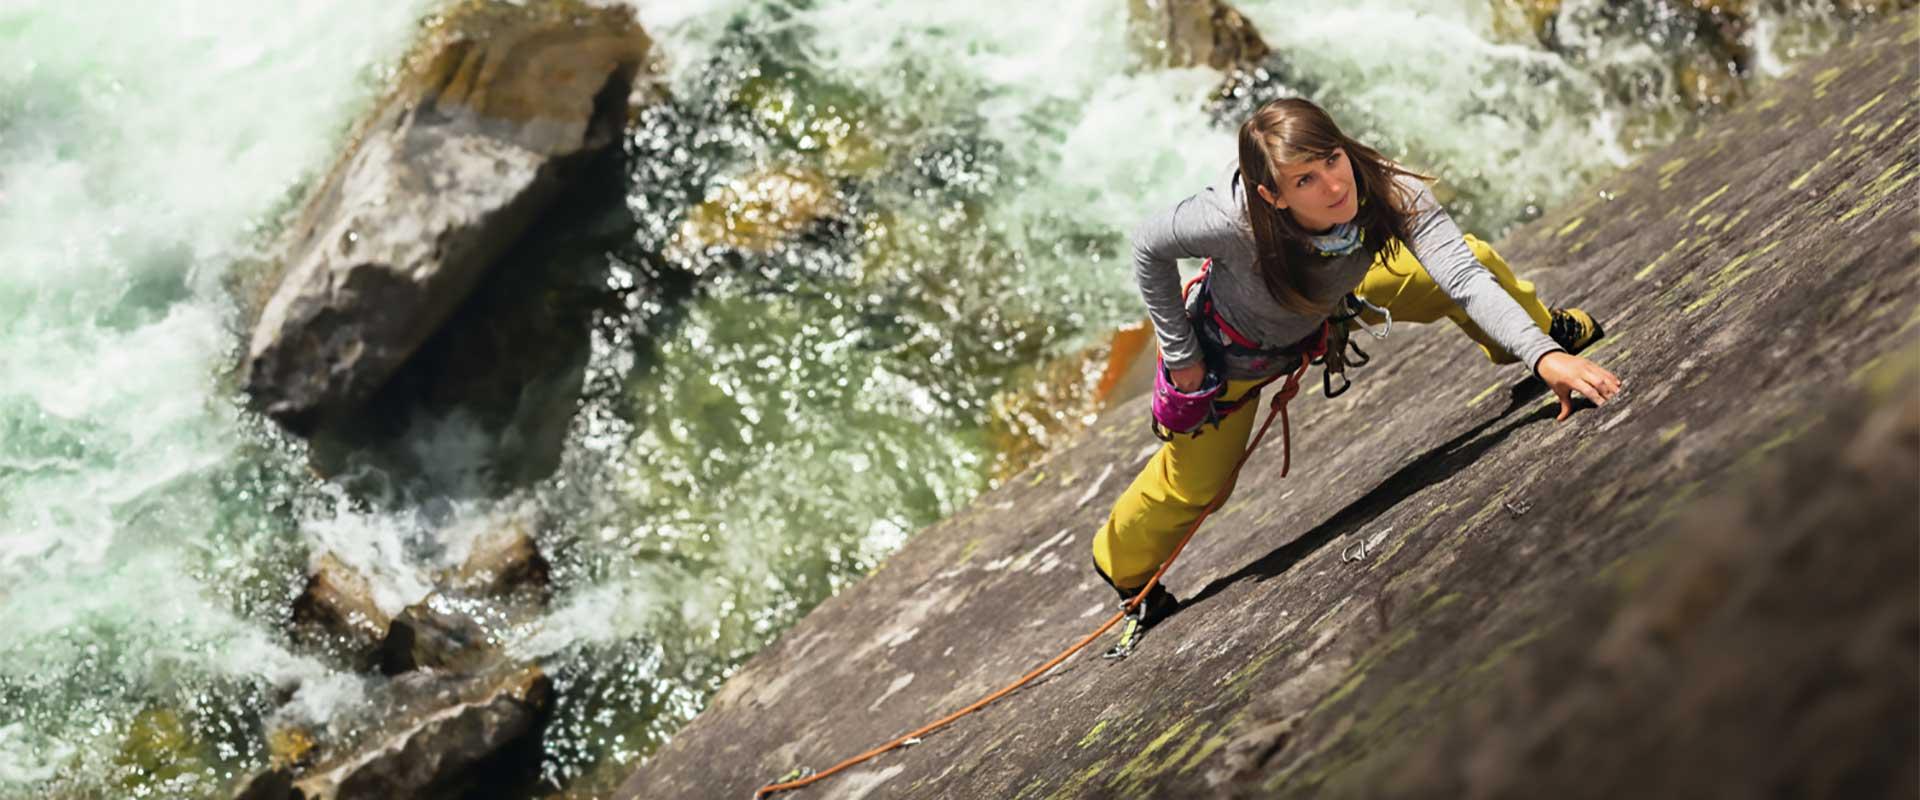 strubel-sport-lenk-deuter-kletterfoto-klausfengler-web